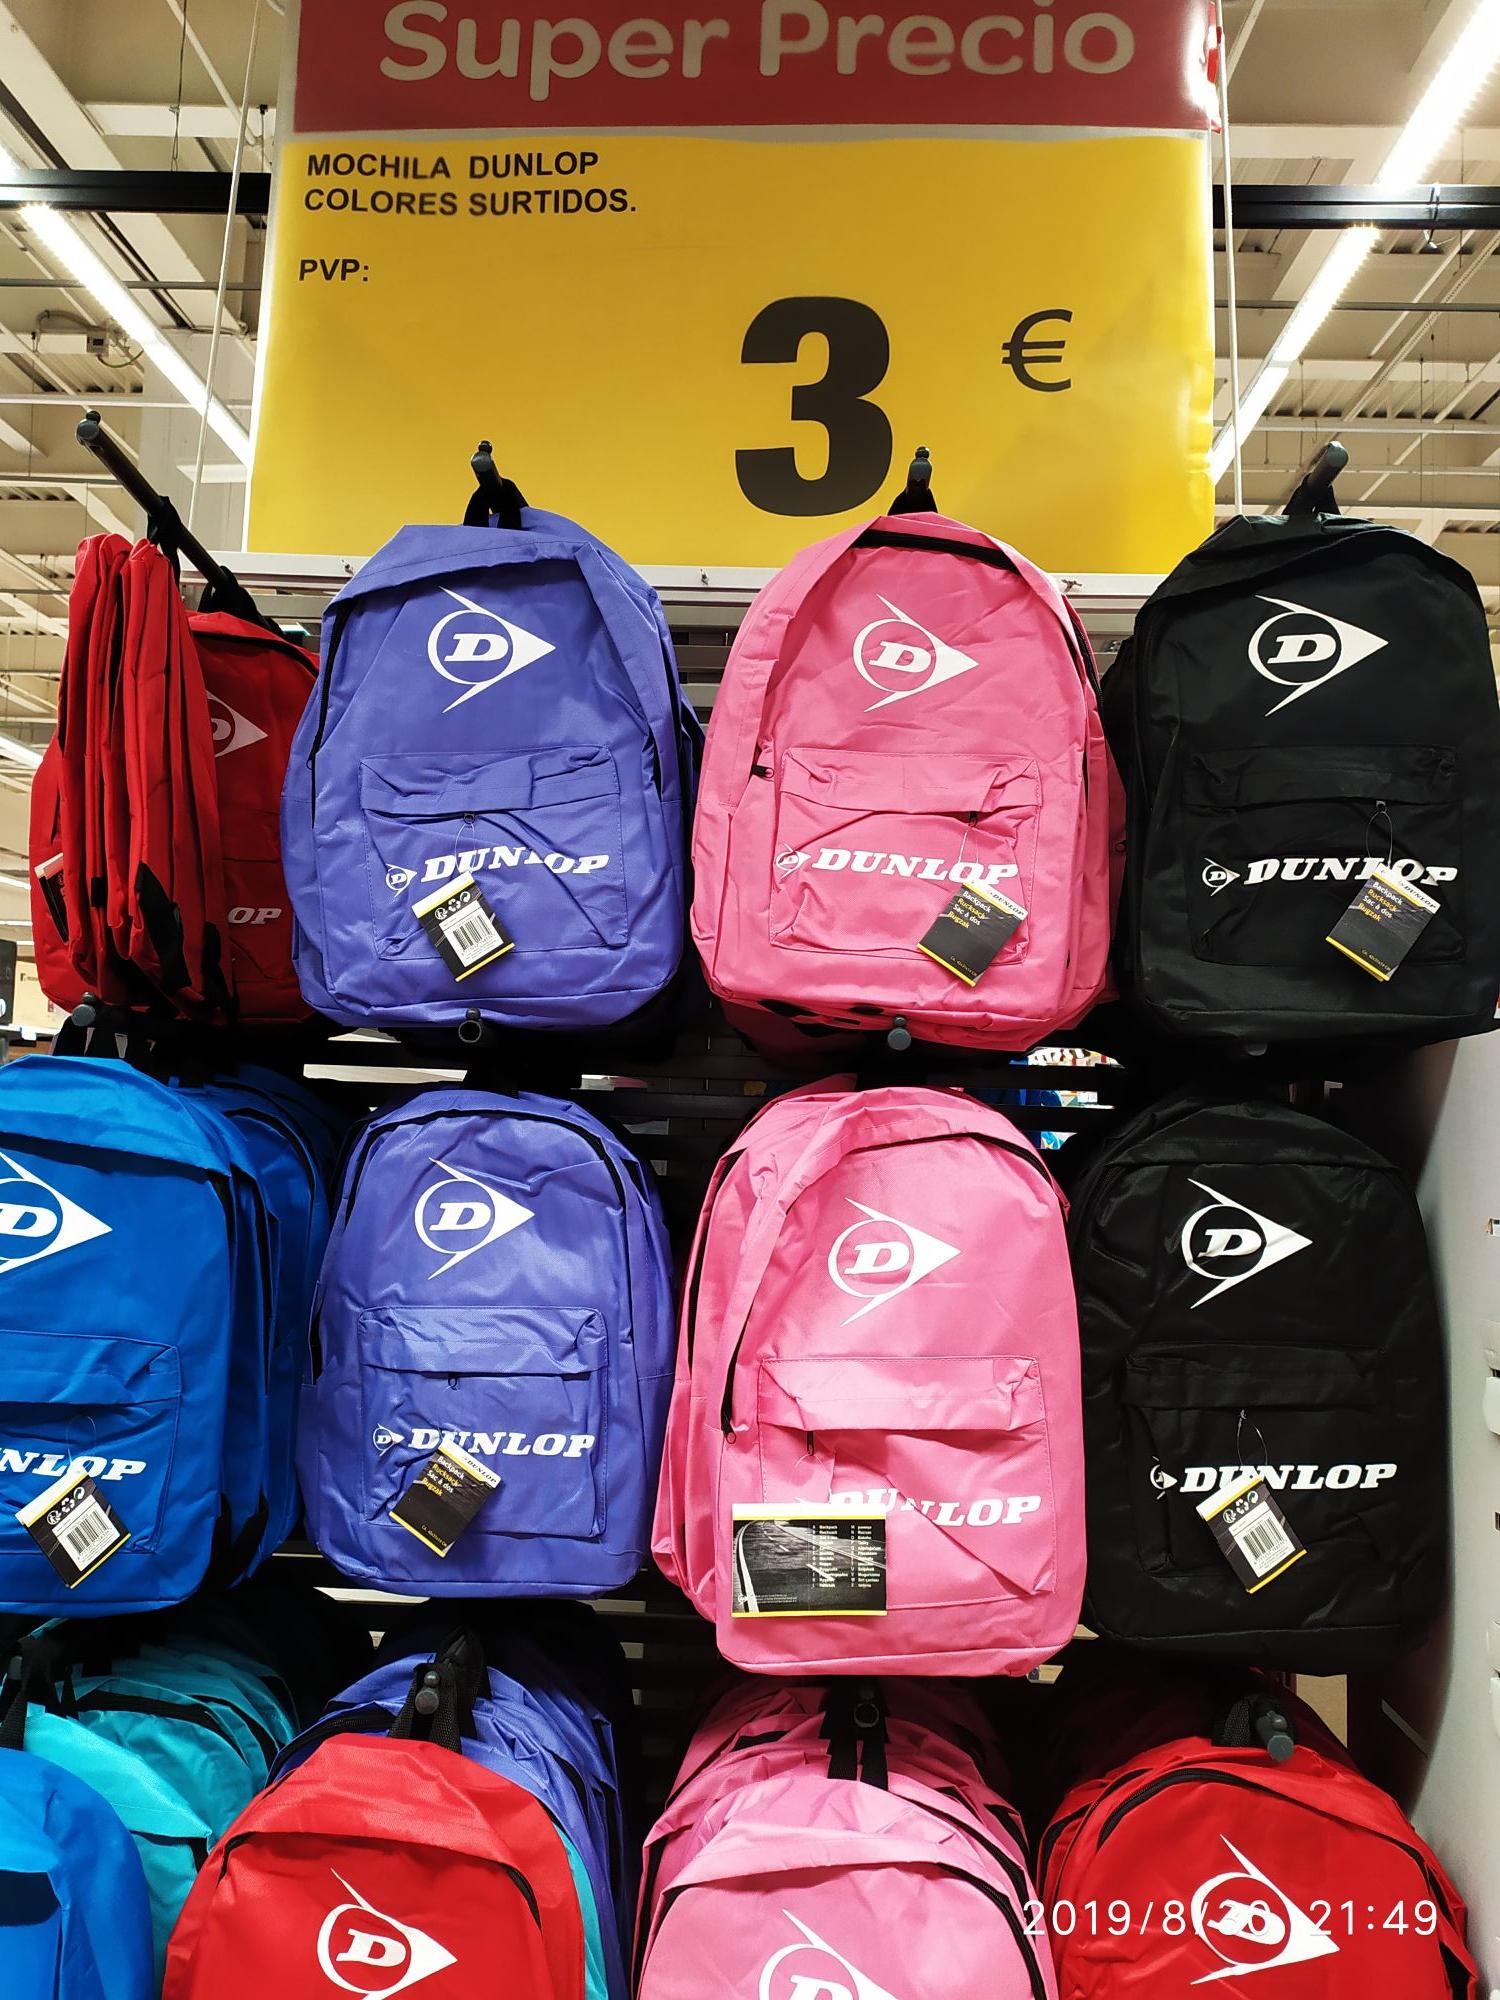 Mochila a 3€ Dunlop!!! en Carrefour